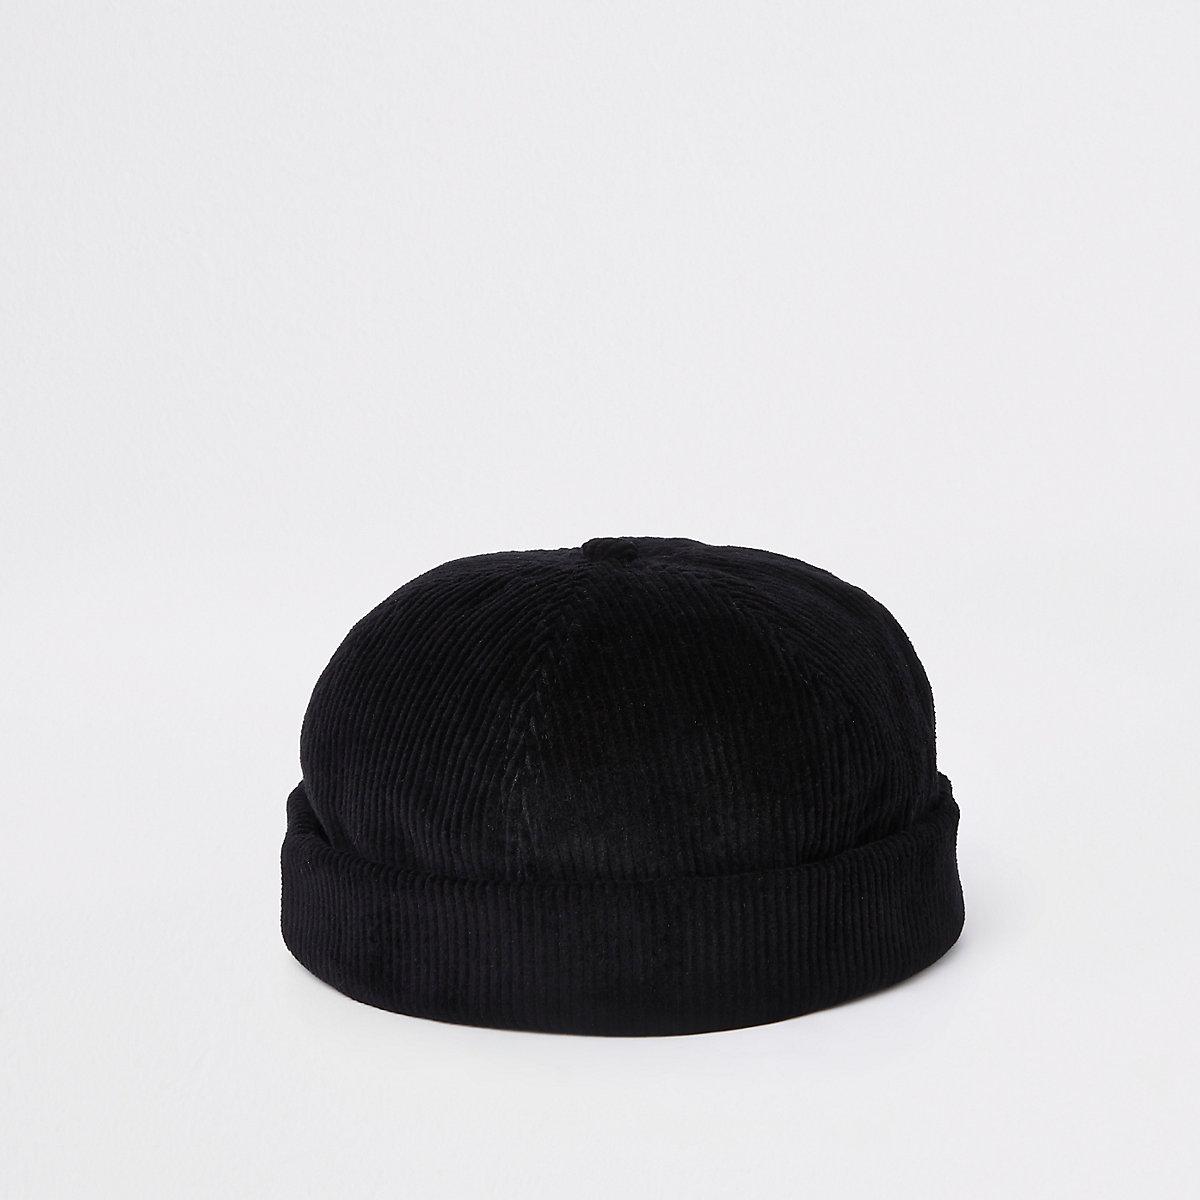 Schwarze Beanie